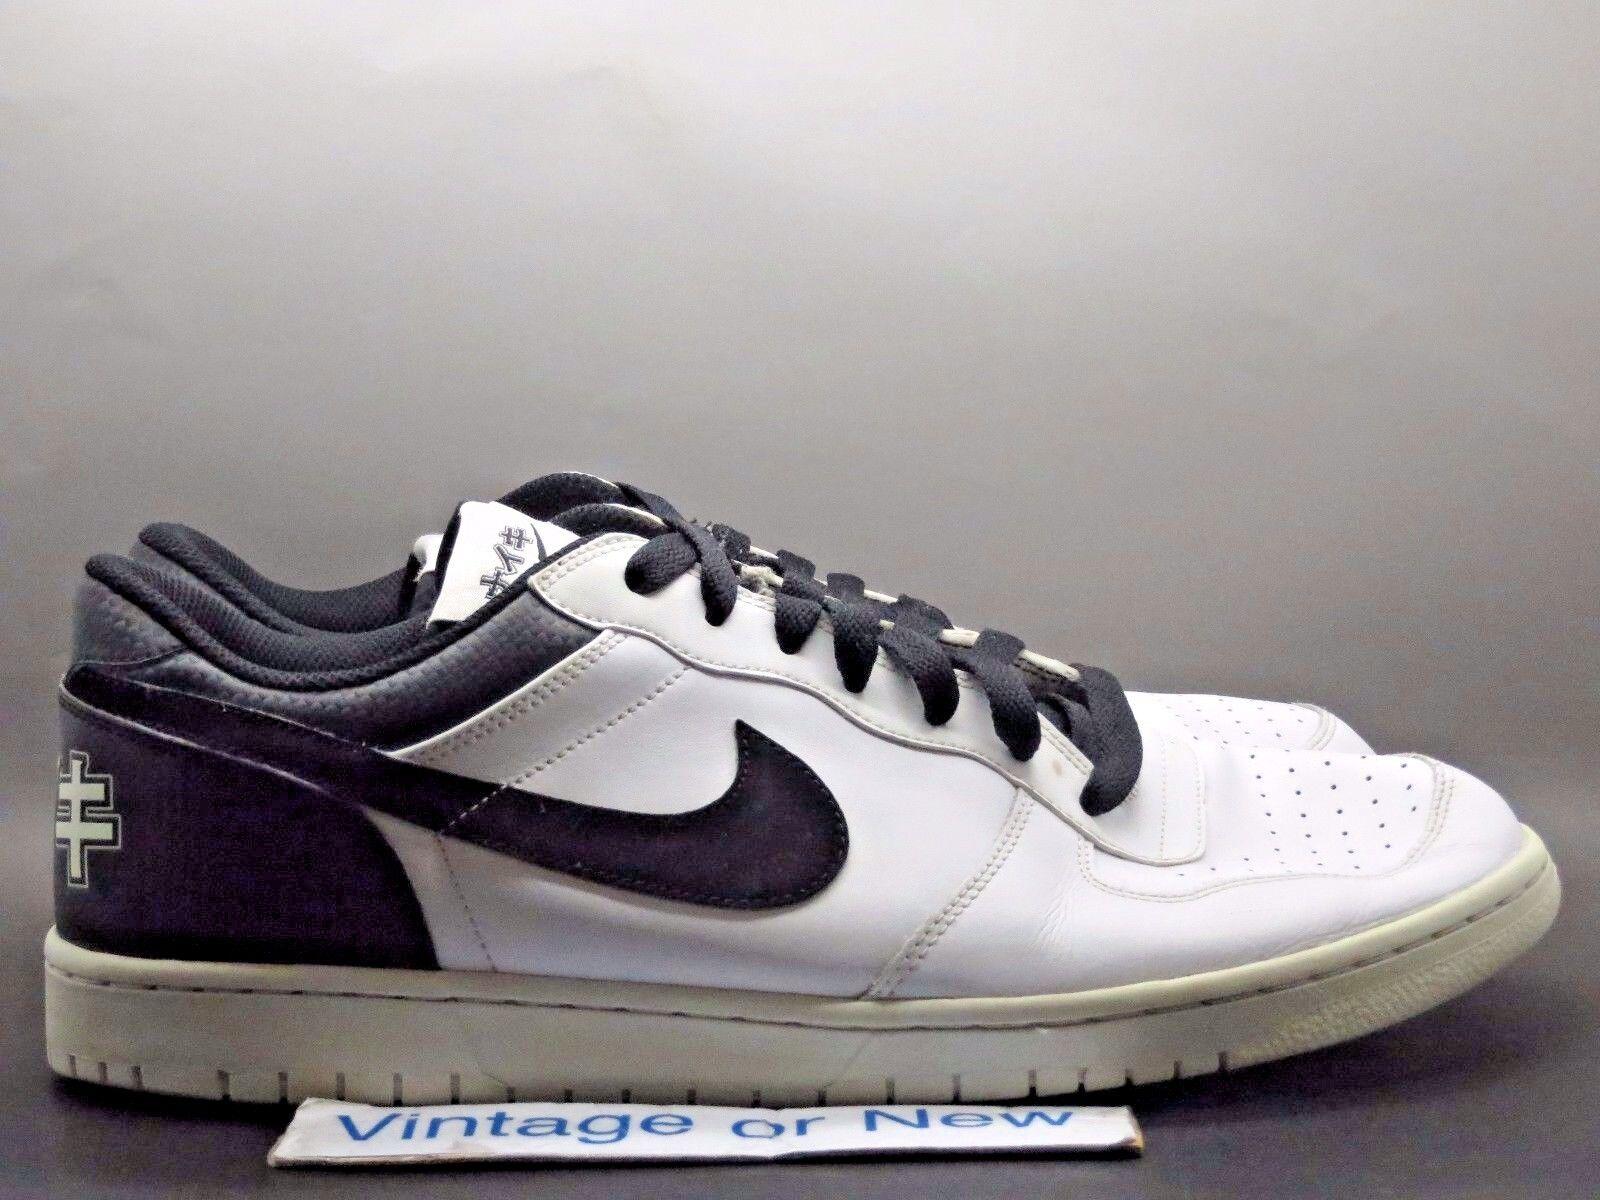 aded39ea67d0 Big Nike Low Katakana Pack White White White Black 2009 sz 15 b2f1a3 ...